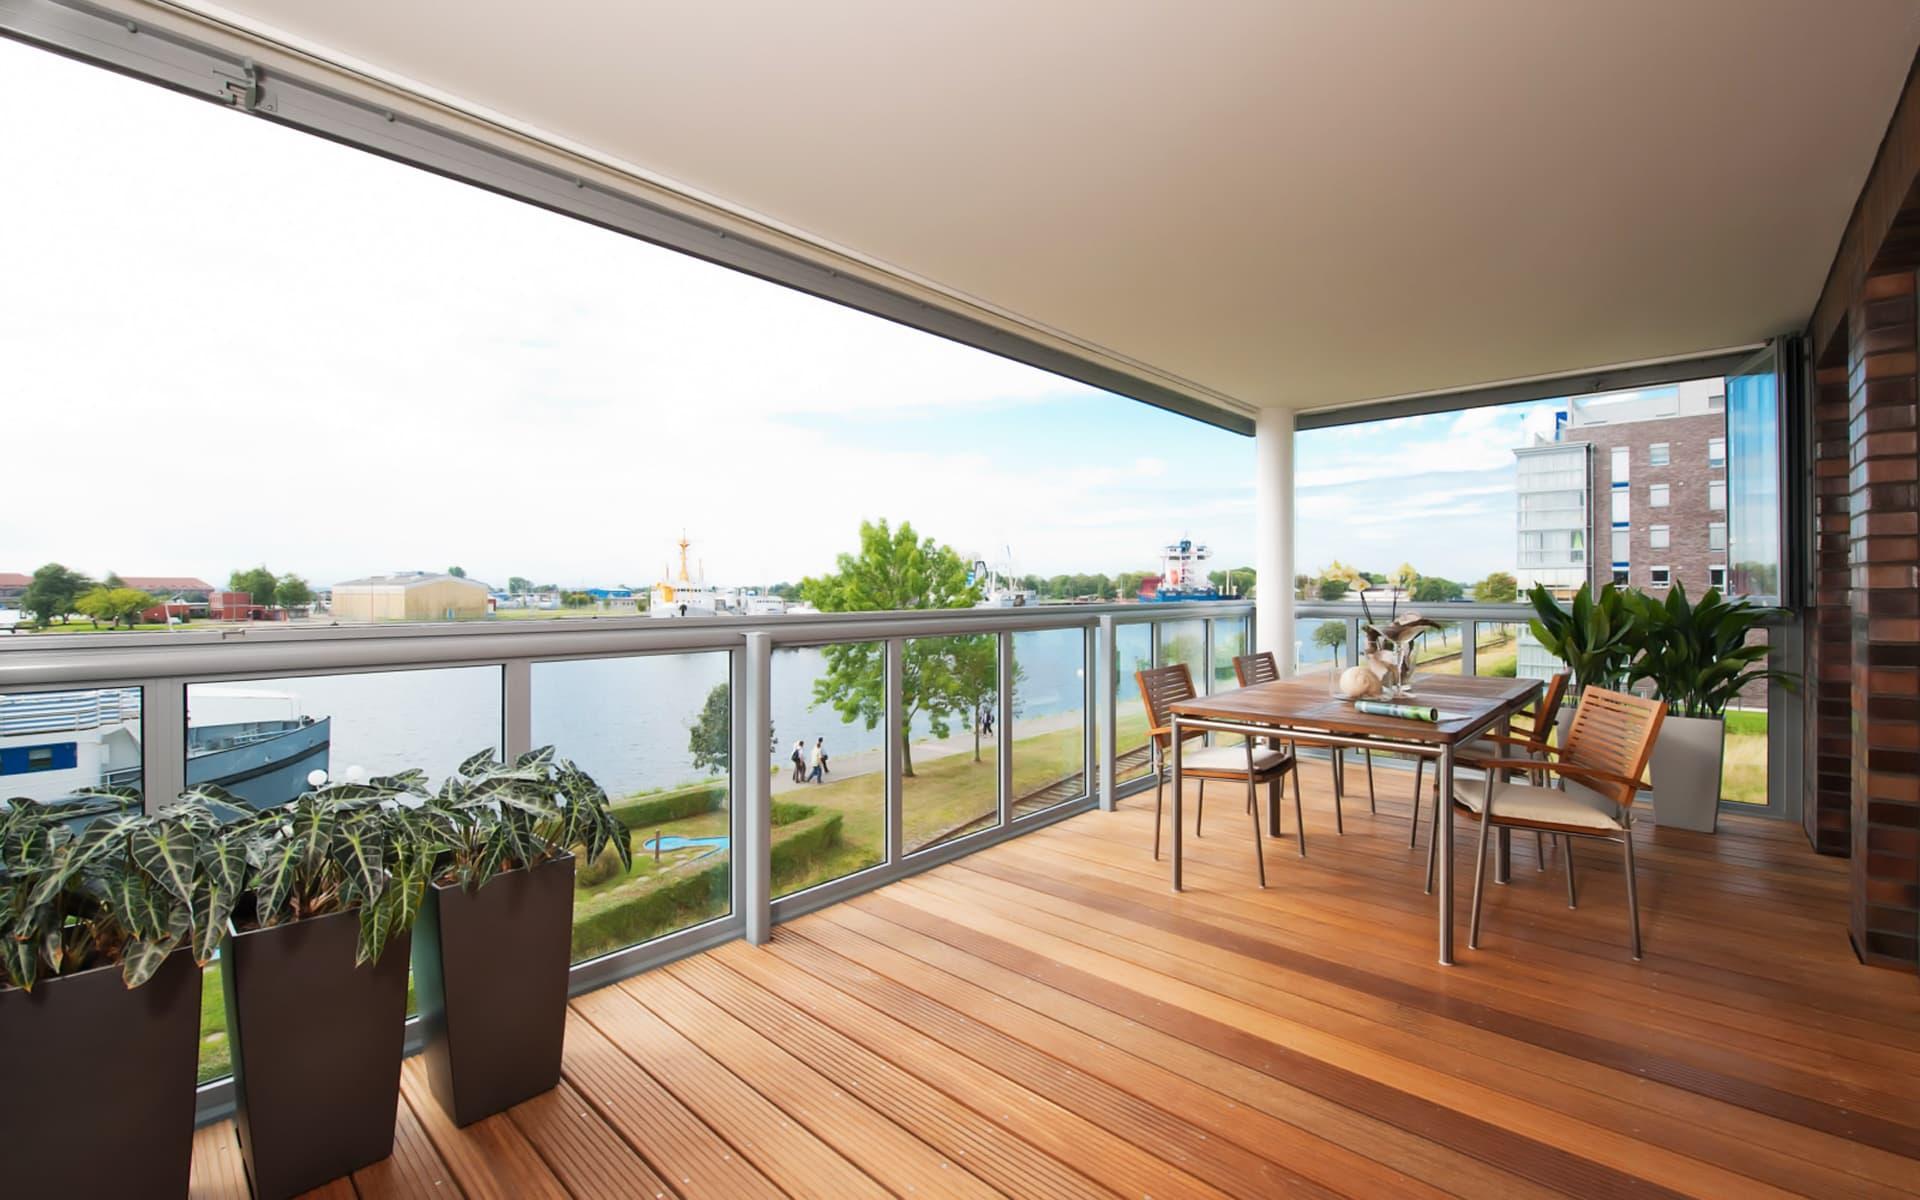 Balkon aus Glas aus Alu